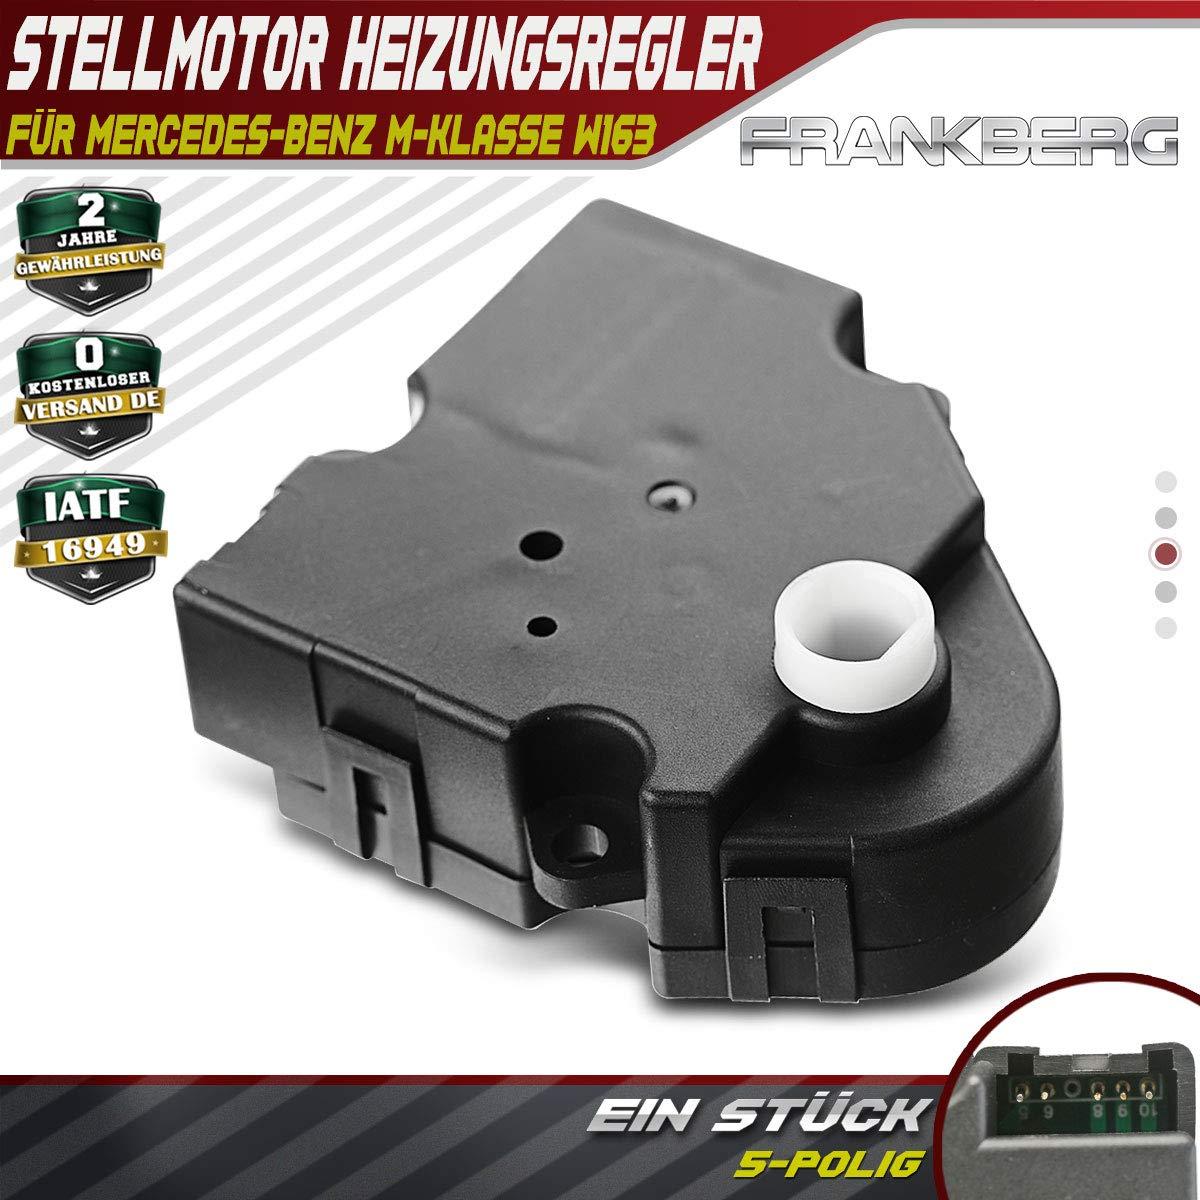 Stellmotor Heizungsregler Klima AC Heizung f/ür W163 ML230 ML270 ML320 ML350 ML400 ML430 ML500 ML55 AMG 1998-2005 604-938 1638200108